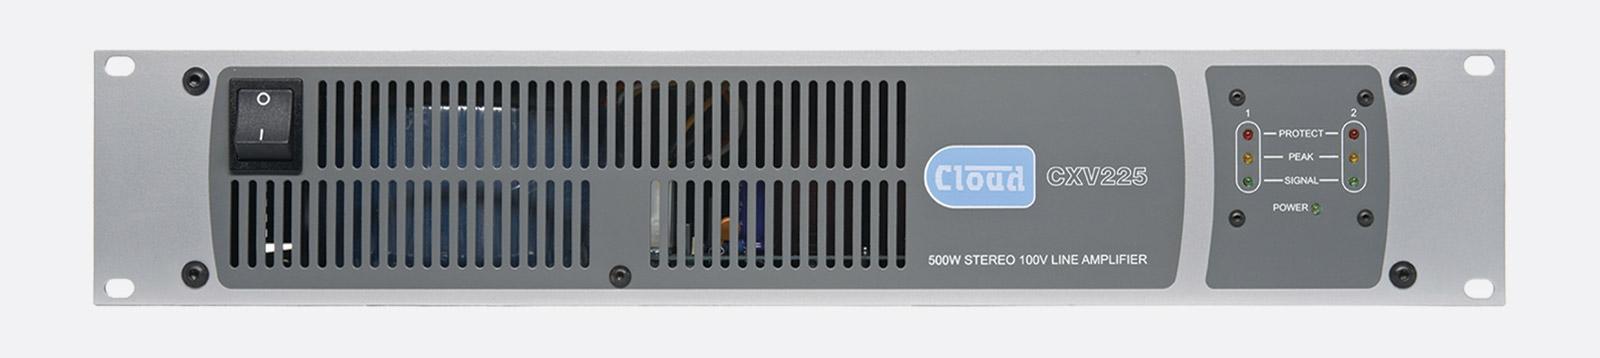 cloud cxv225 power amplifier 100v 2x 250w transformer less topology 2u. Black Bedroom Furniture Sets. Home Design Ideas